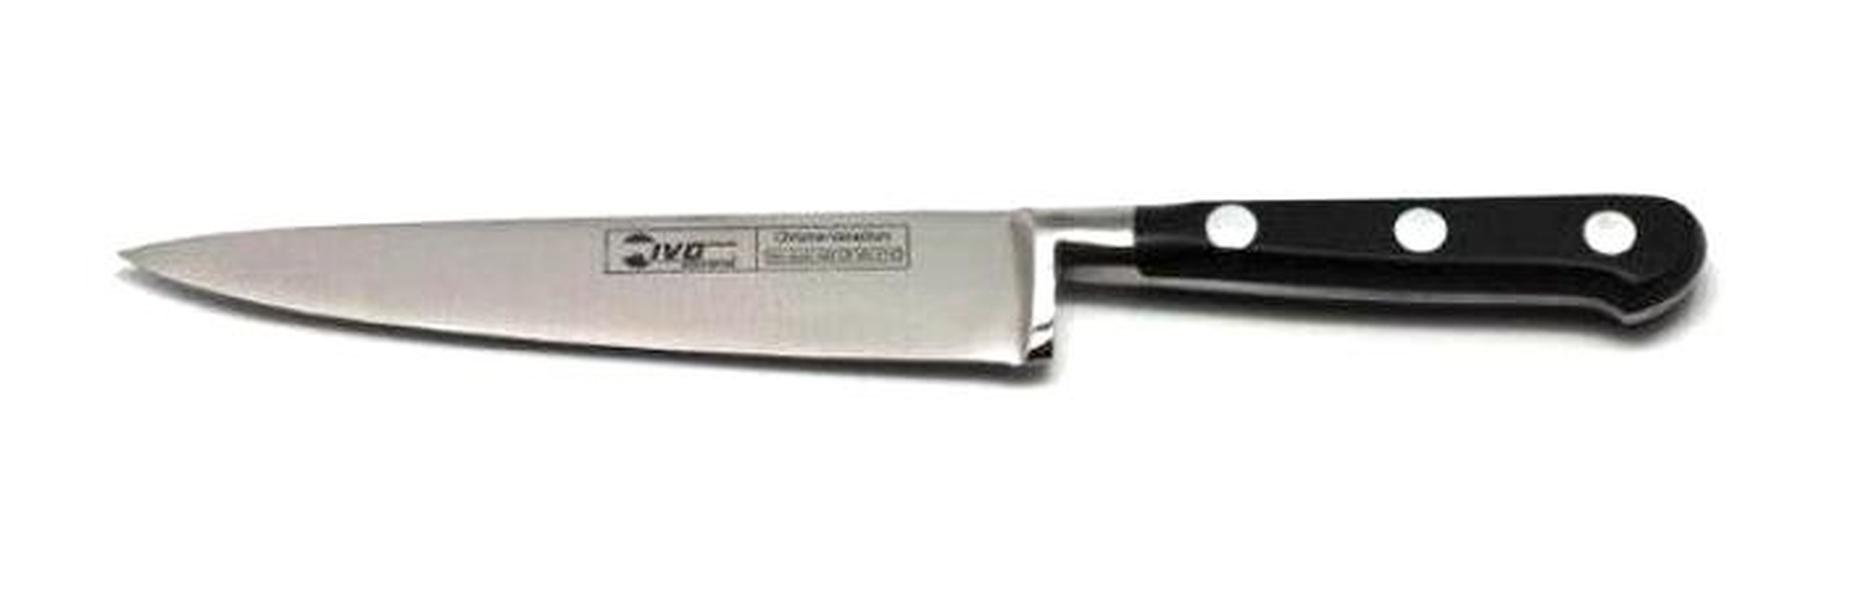 Нож для резки мяса 15 см